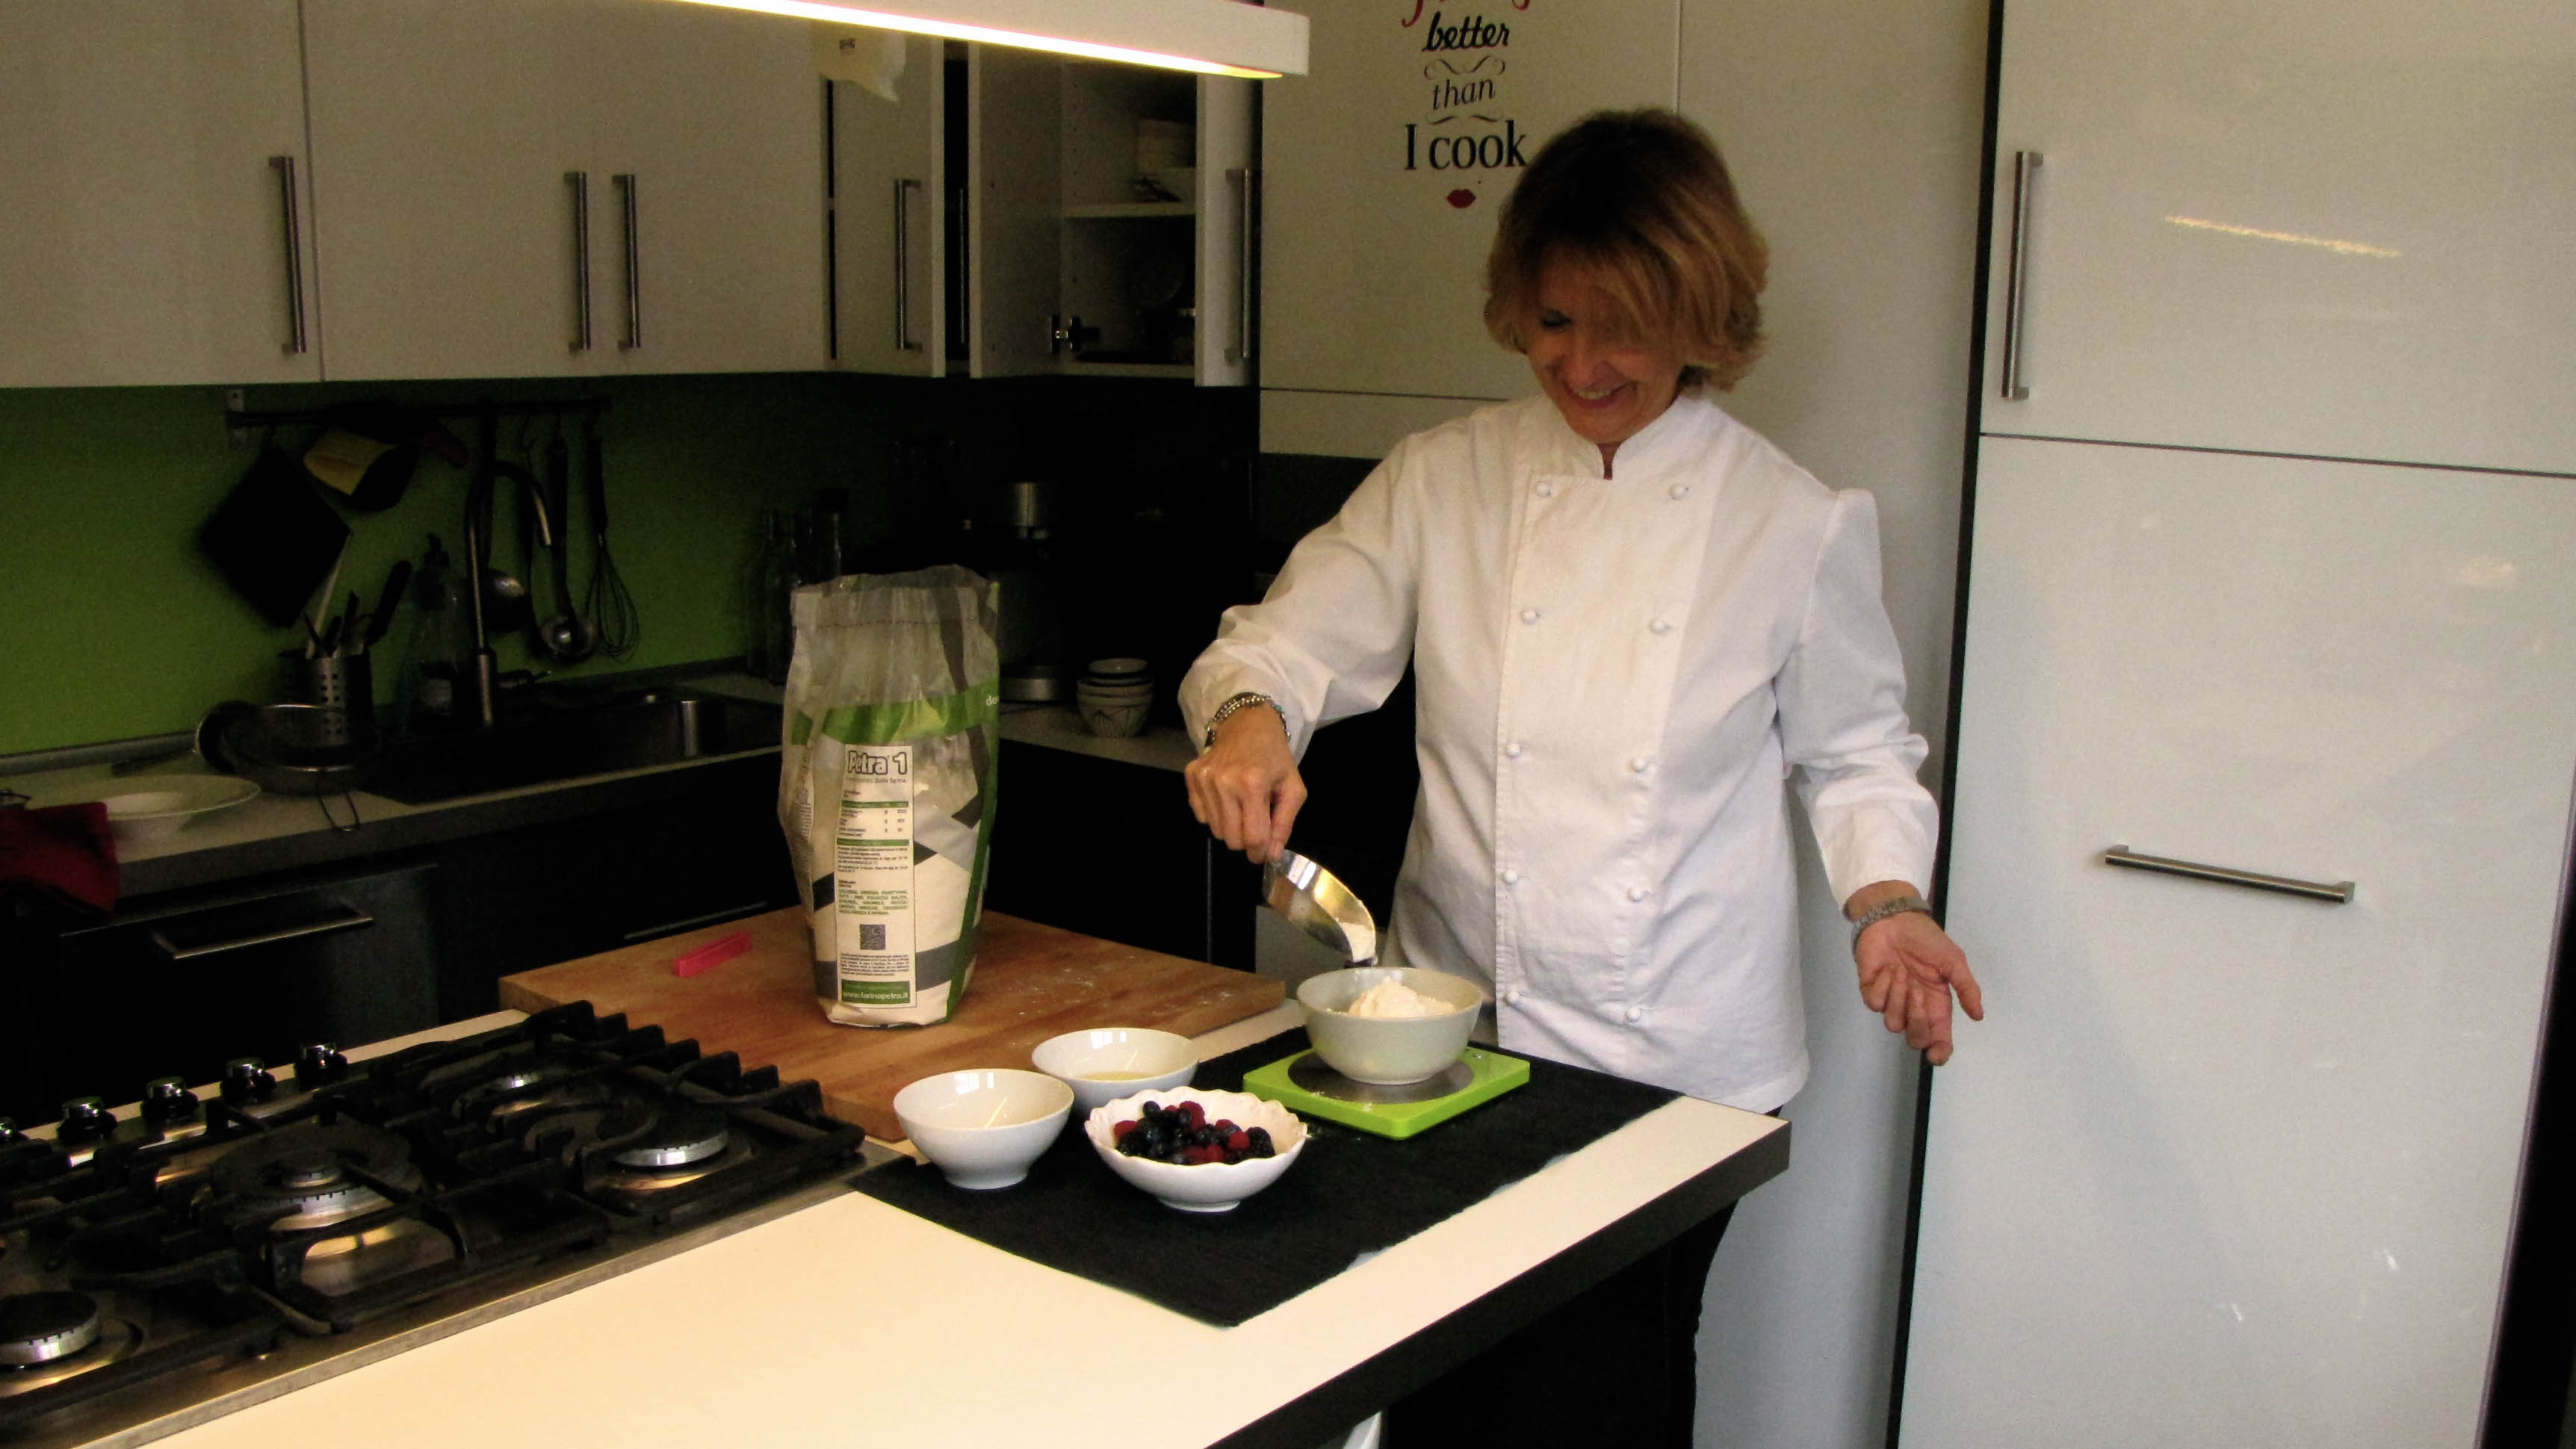 Personal Chef - Gnamm